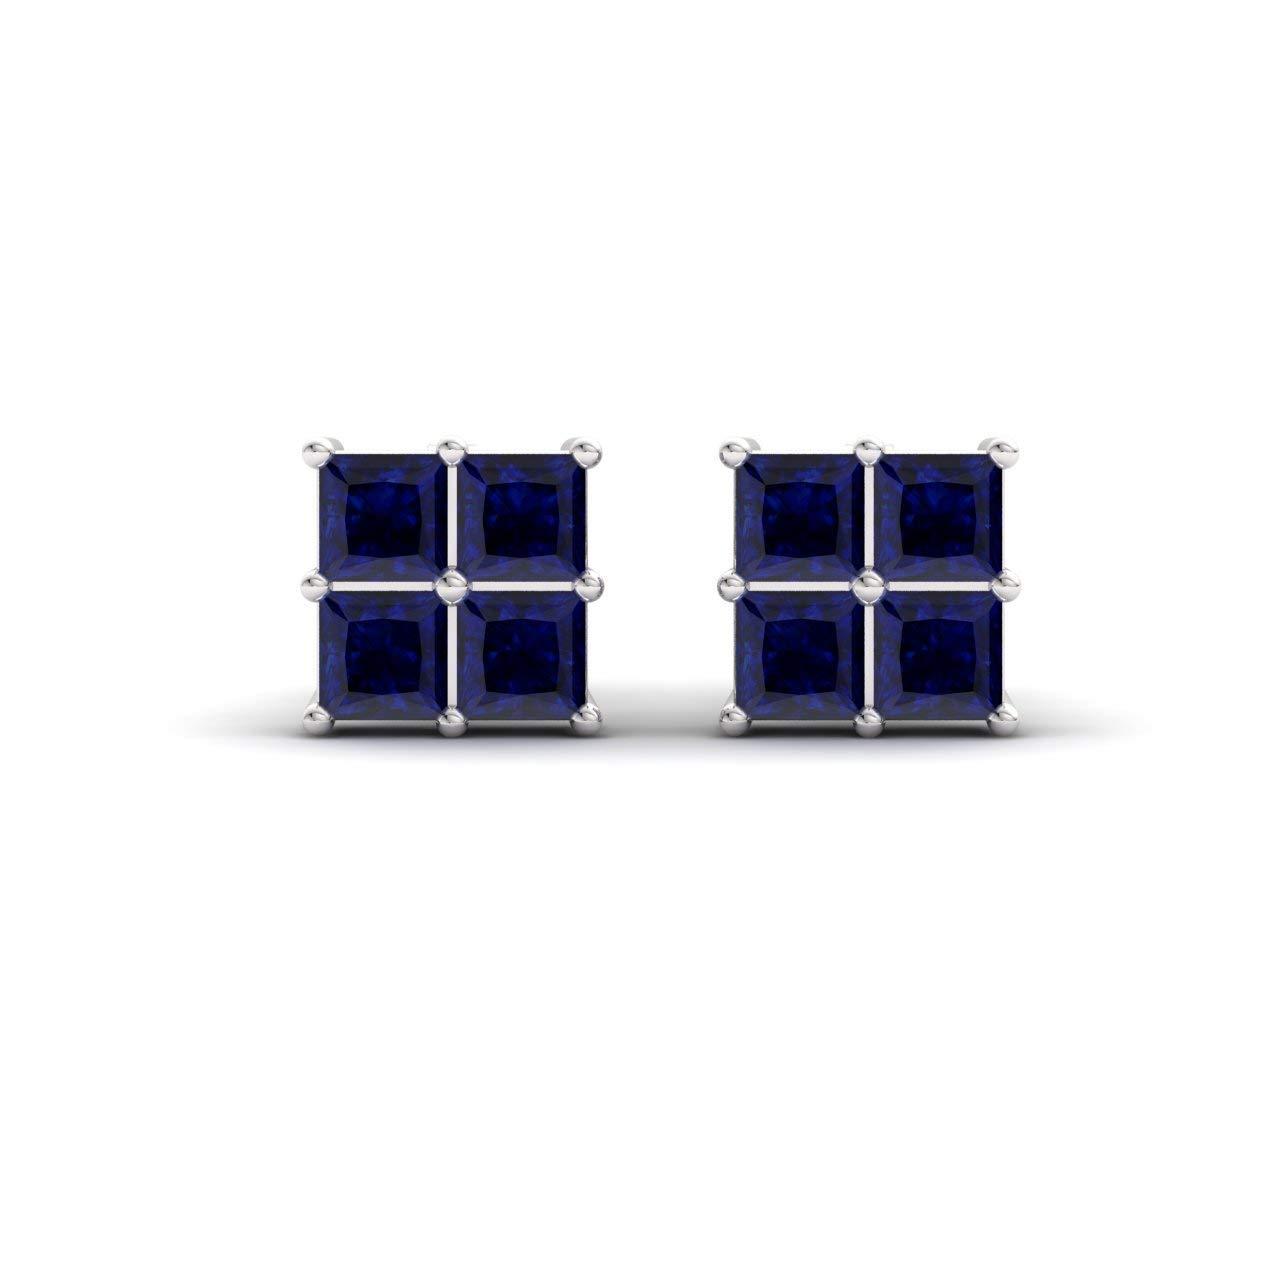 Diamondere Natural and Certified Princess-Cut Gemstone Petite Stud Earrings in 14K Solid Gold | 0.53 Carat Earrings for Women